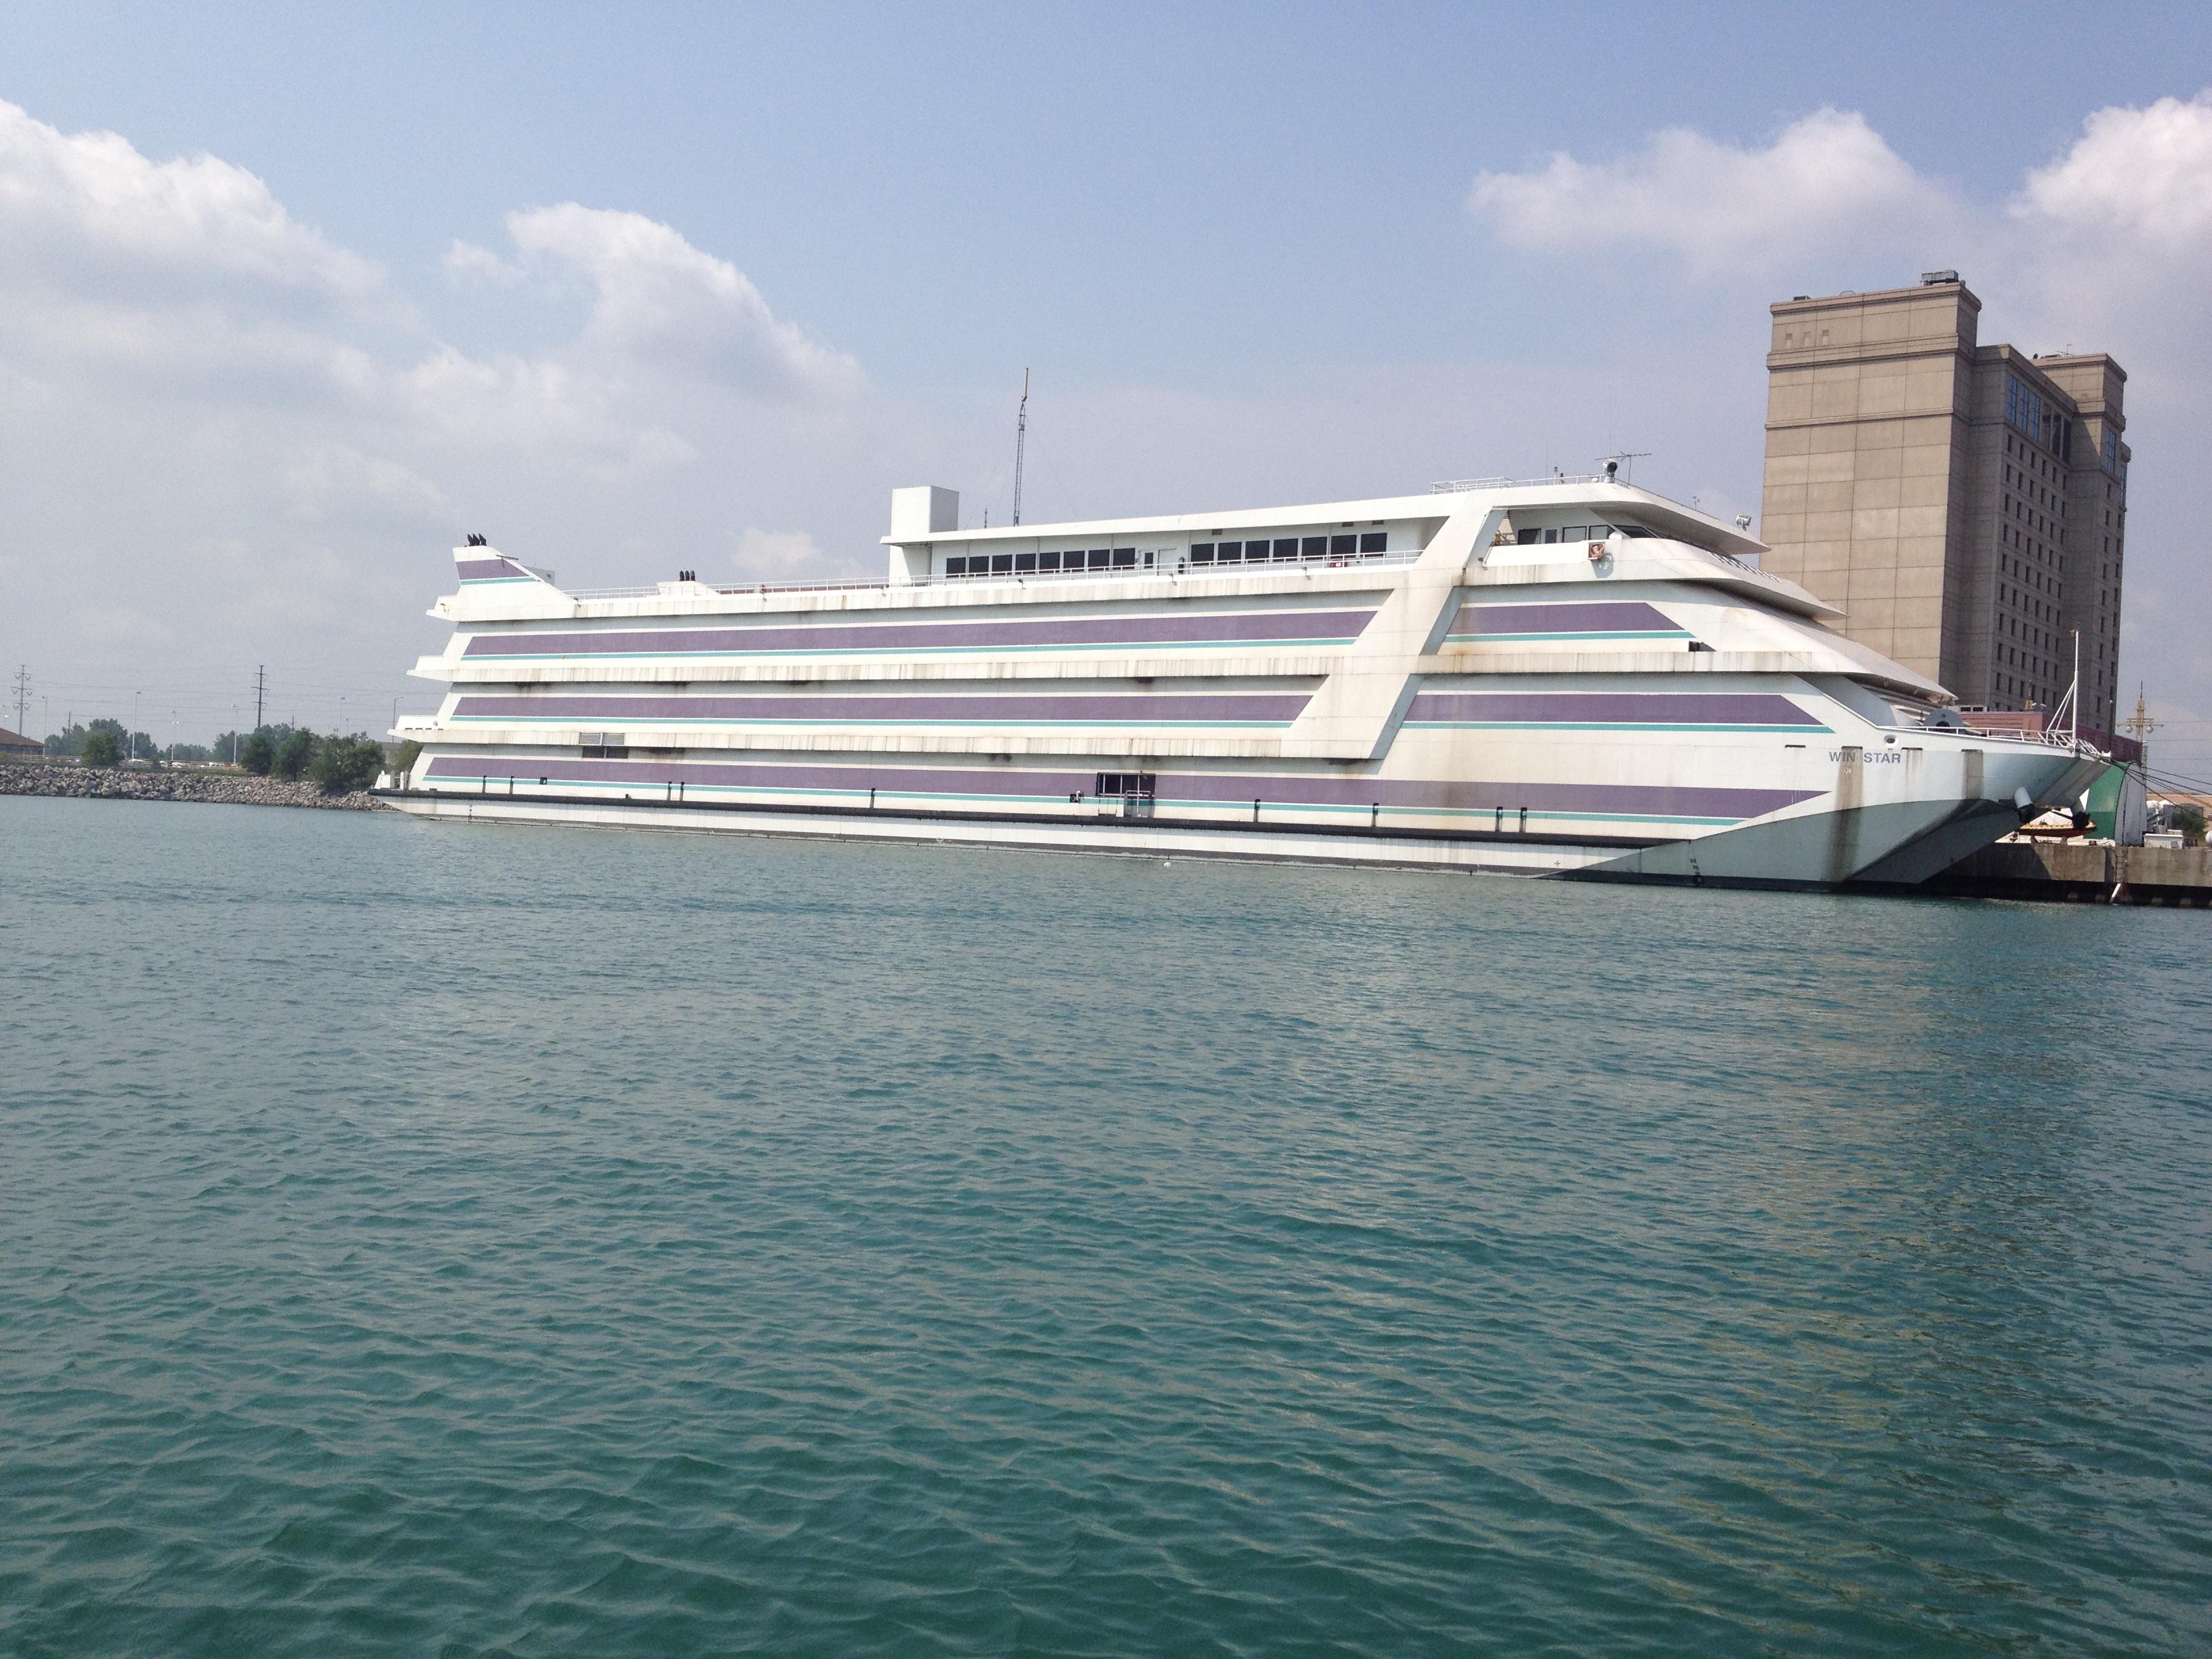 File:Win Star casino boat, July 1 2012.JPG - Wikimedia Commons